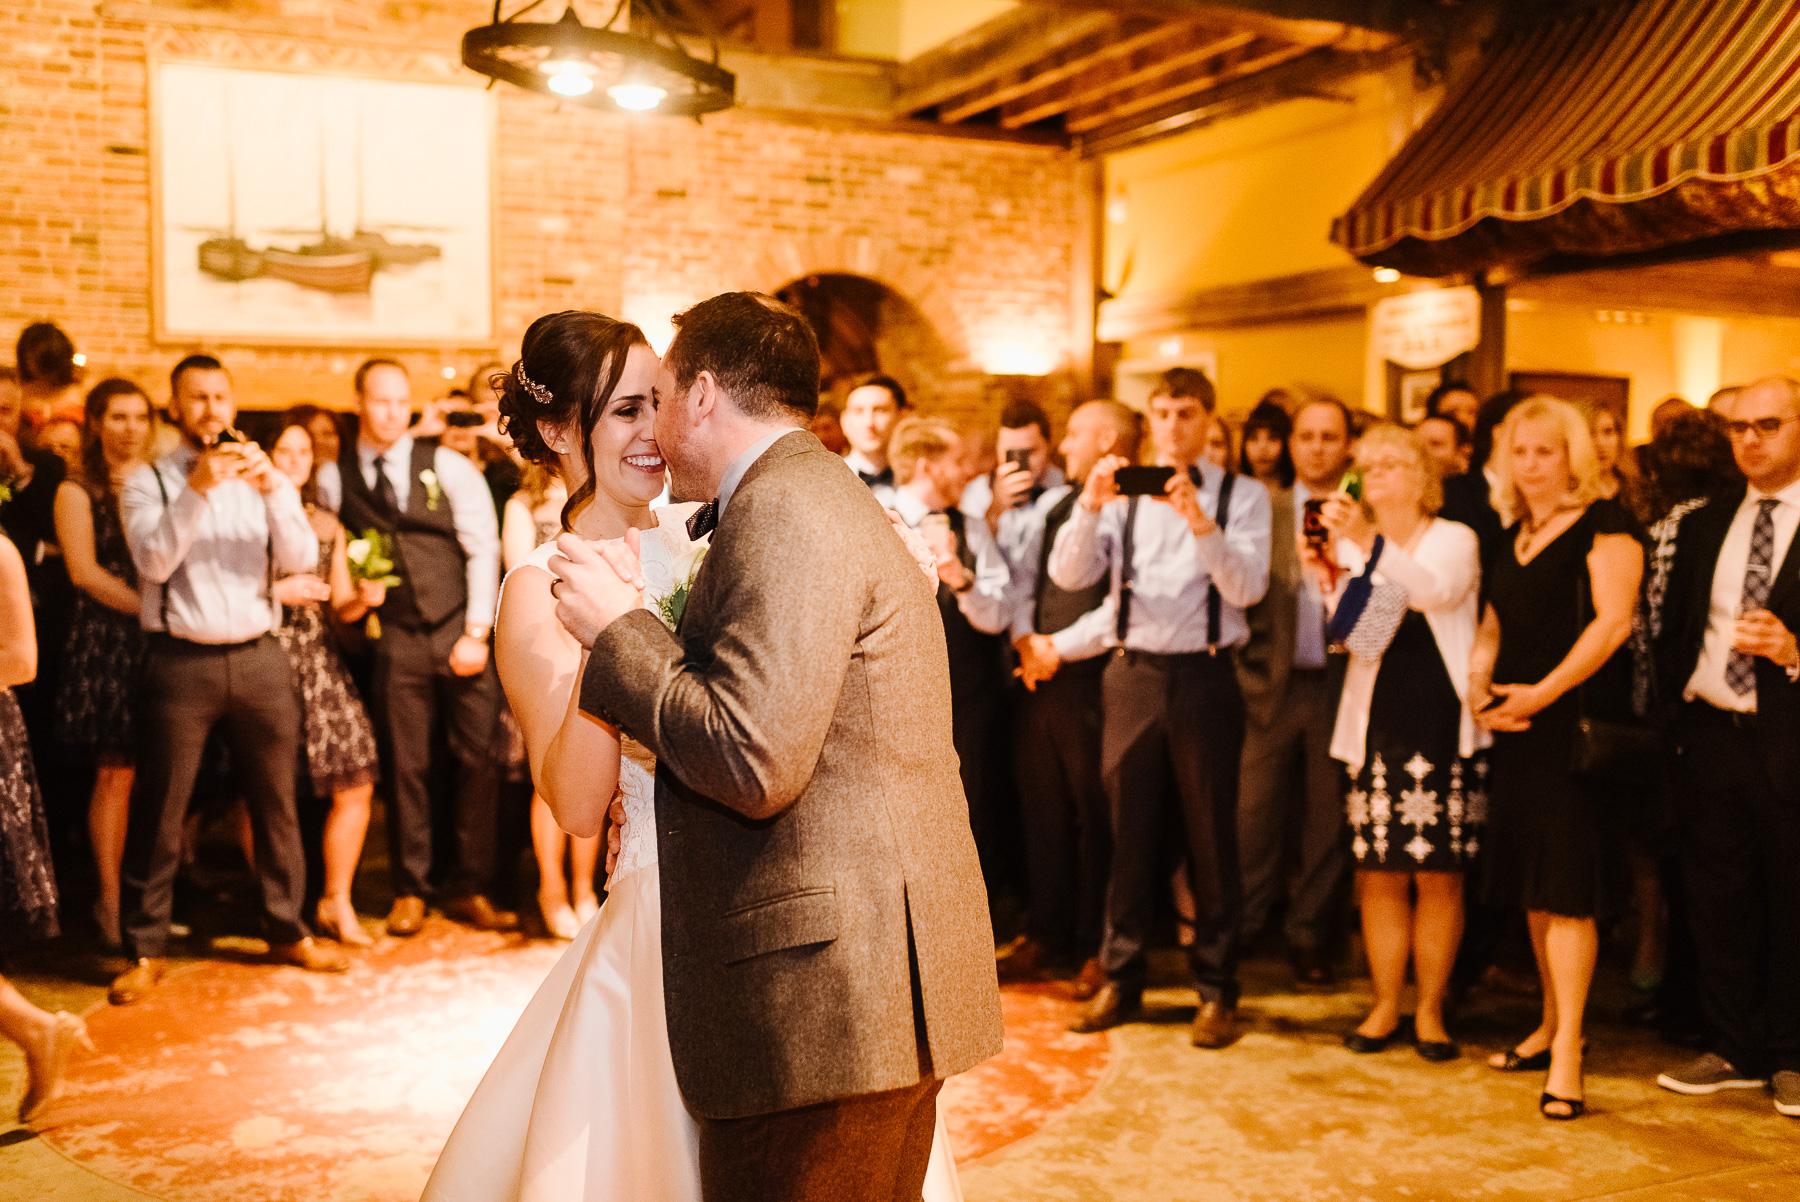 107-Laurita Winery Wedding New Jersey Wedding Photographer Laurita Winery Weddings Longbrook Photography.jpg